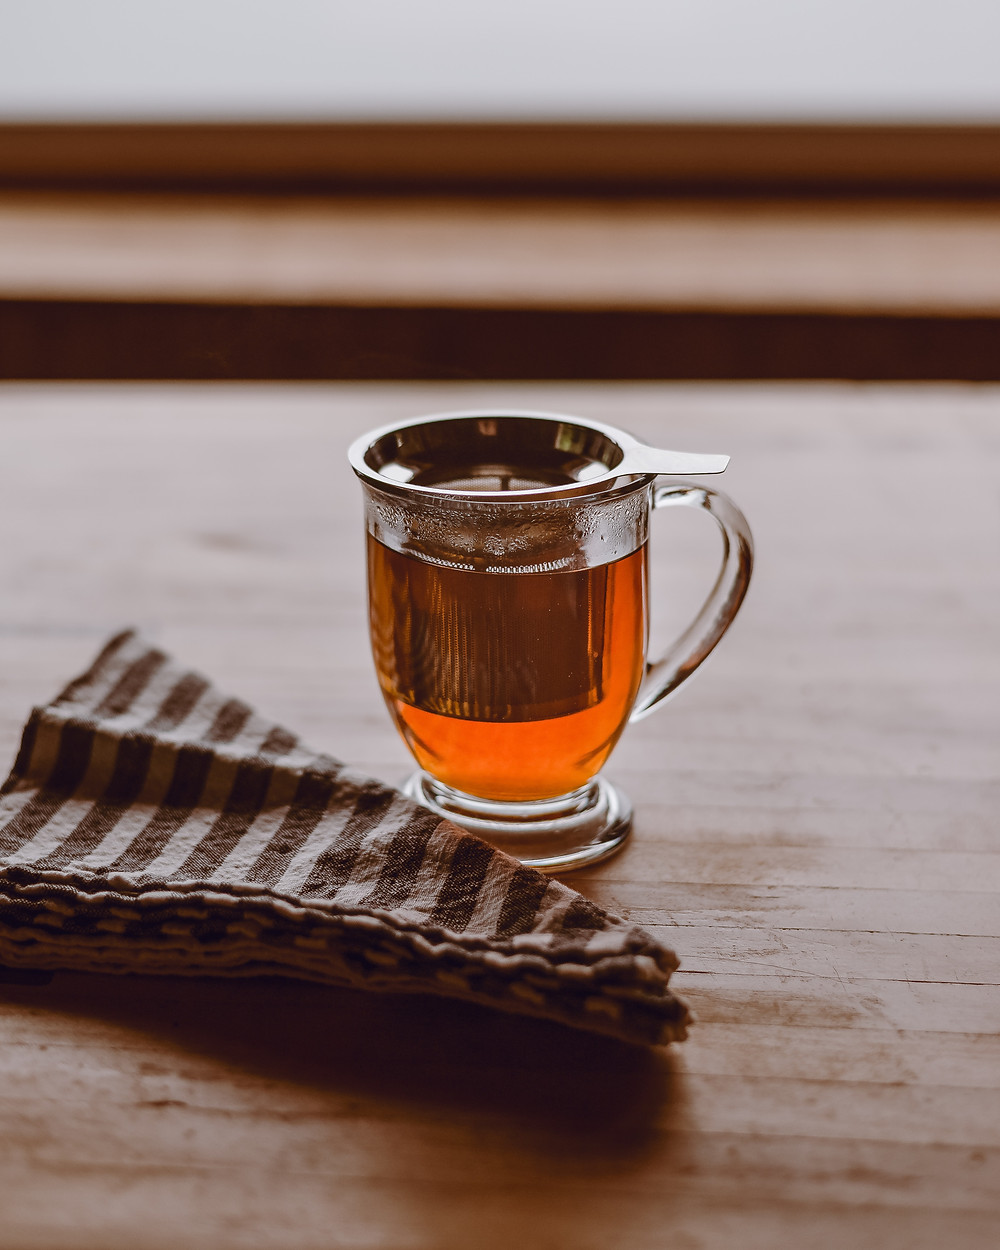 benefits of blending your own tea